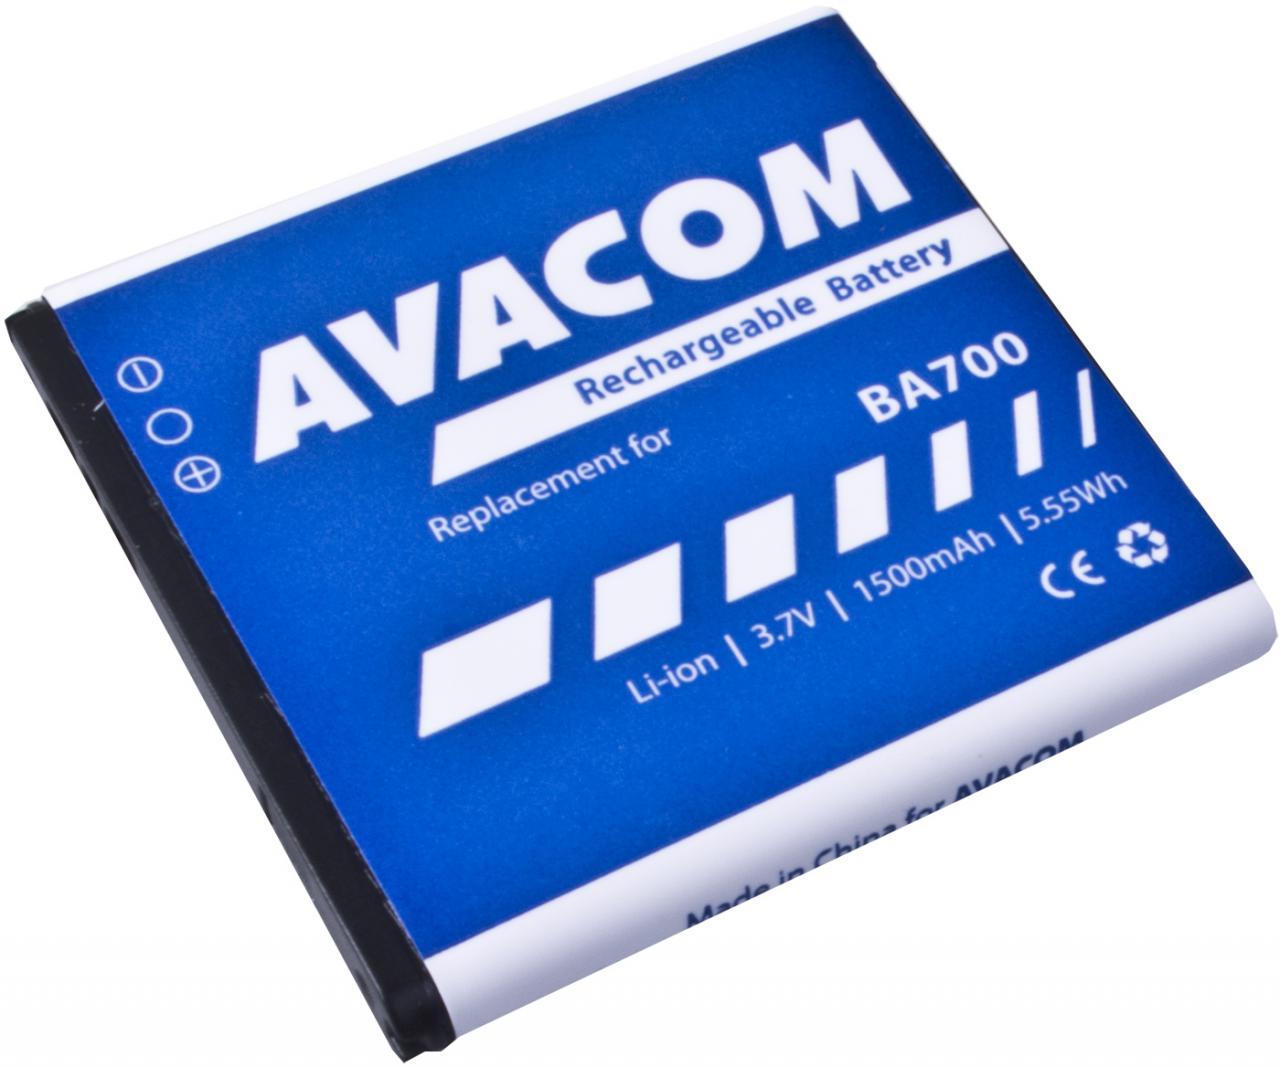 AVACOM Baterie AVACOM GSSE-NEO-1500A do mobilu Sony Ericsson Xperia Neo, Pro, Ray Li-Ion 3,7V (GSSE-NEO-1500A)